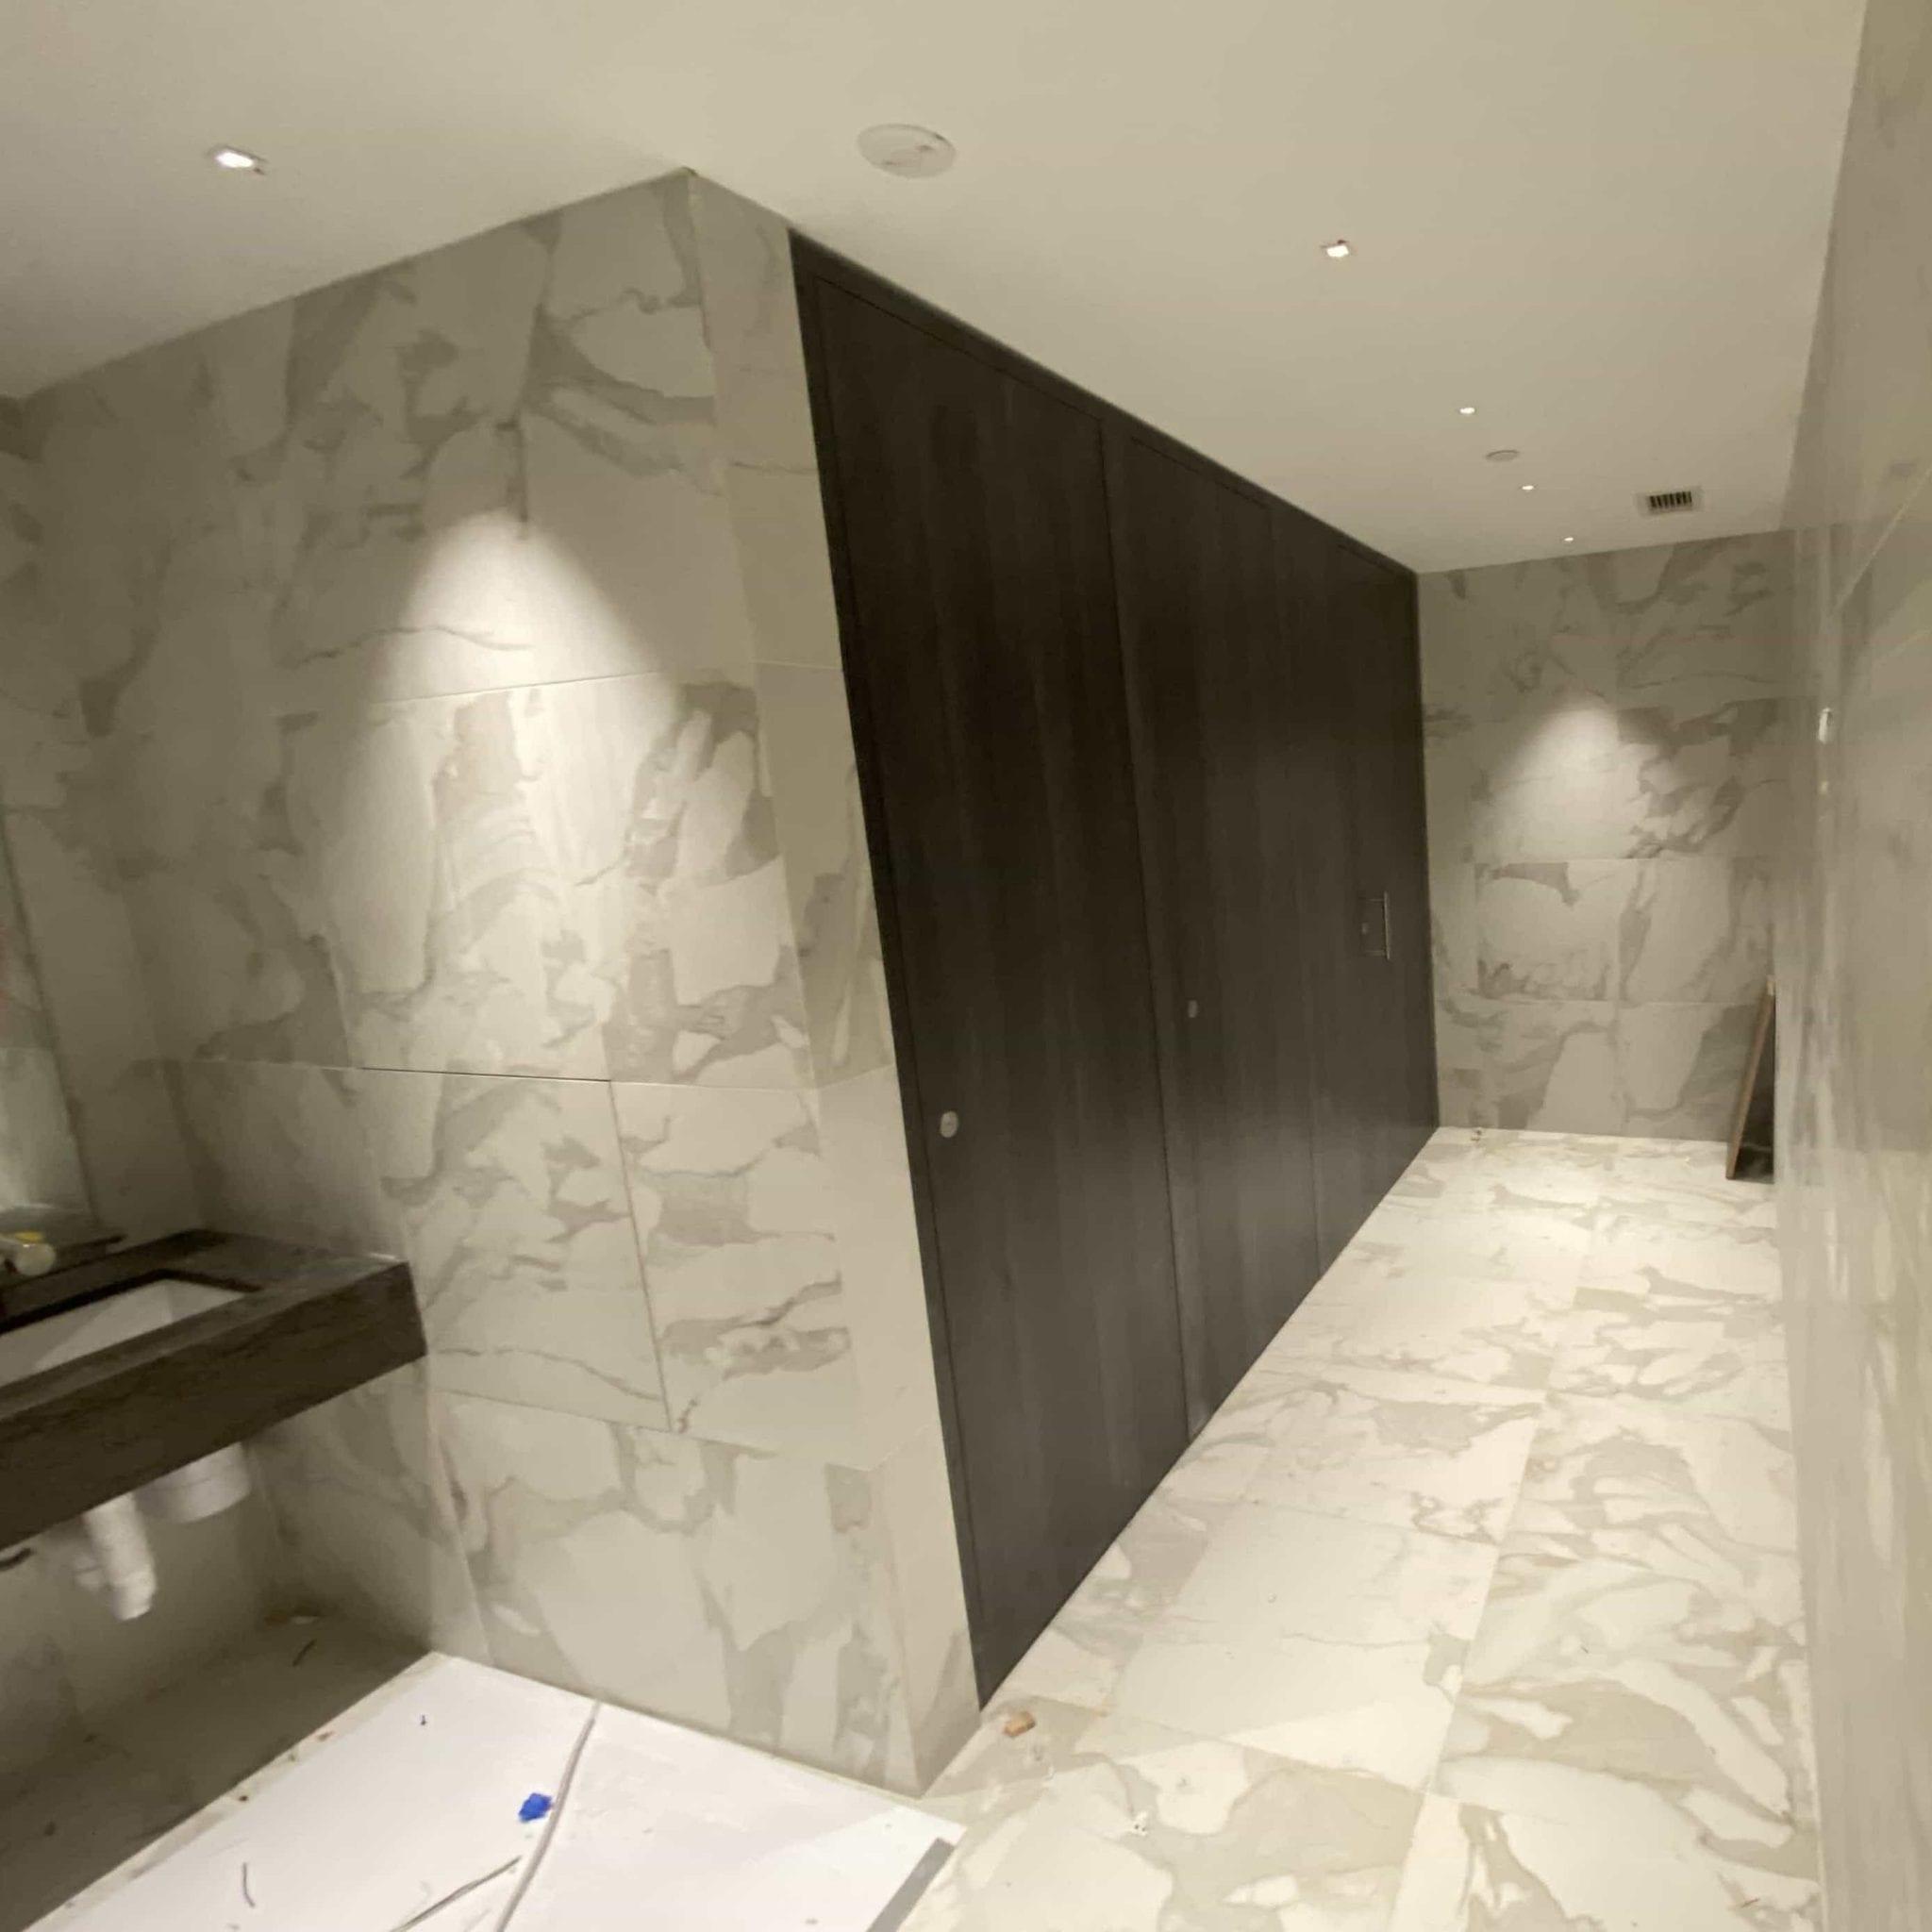 Thrislington Toilet partition install photos